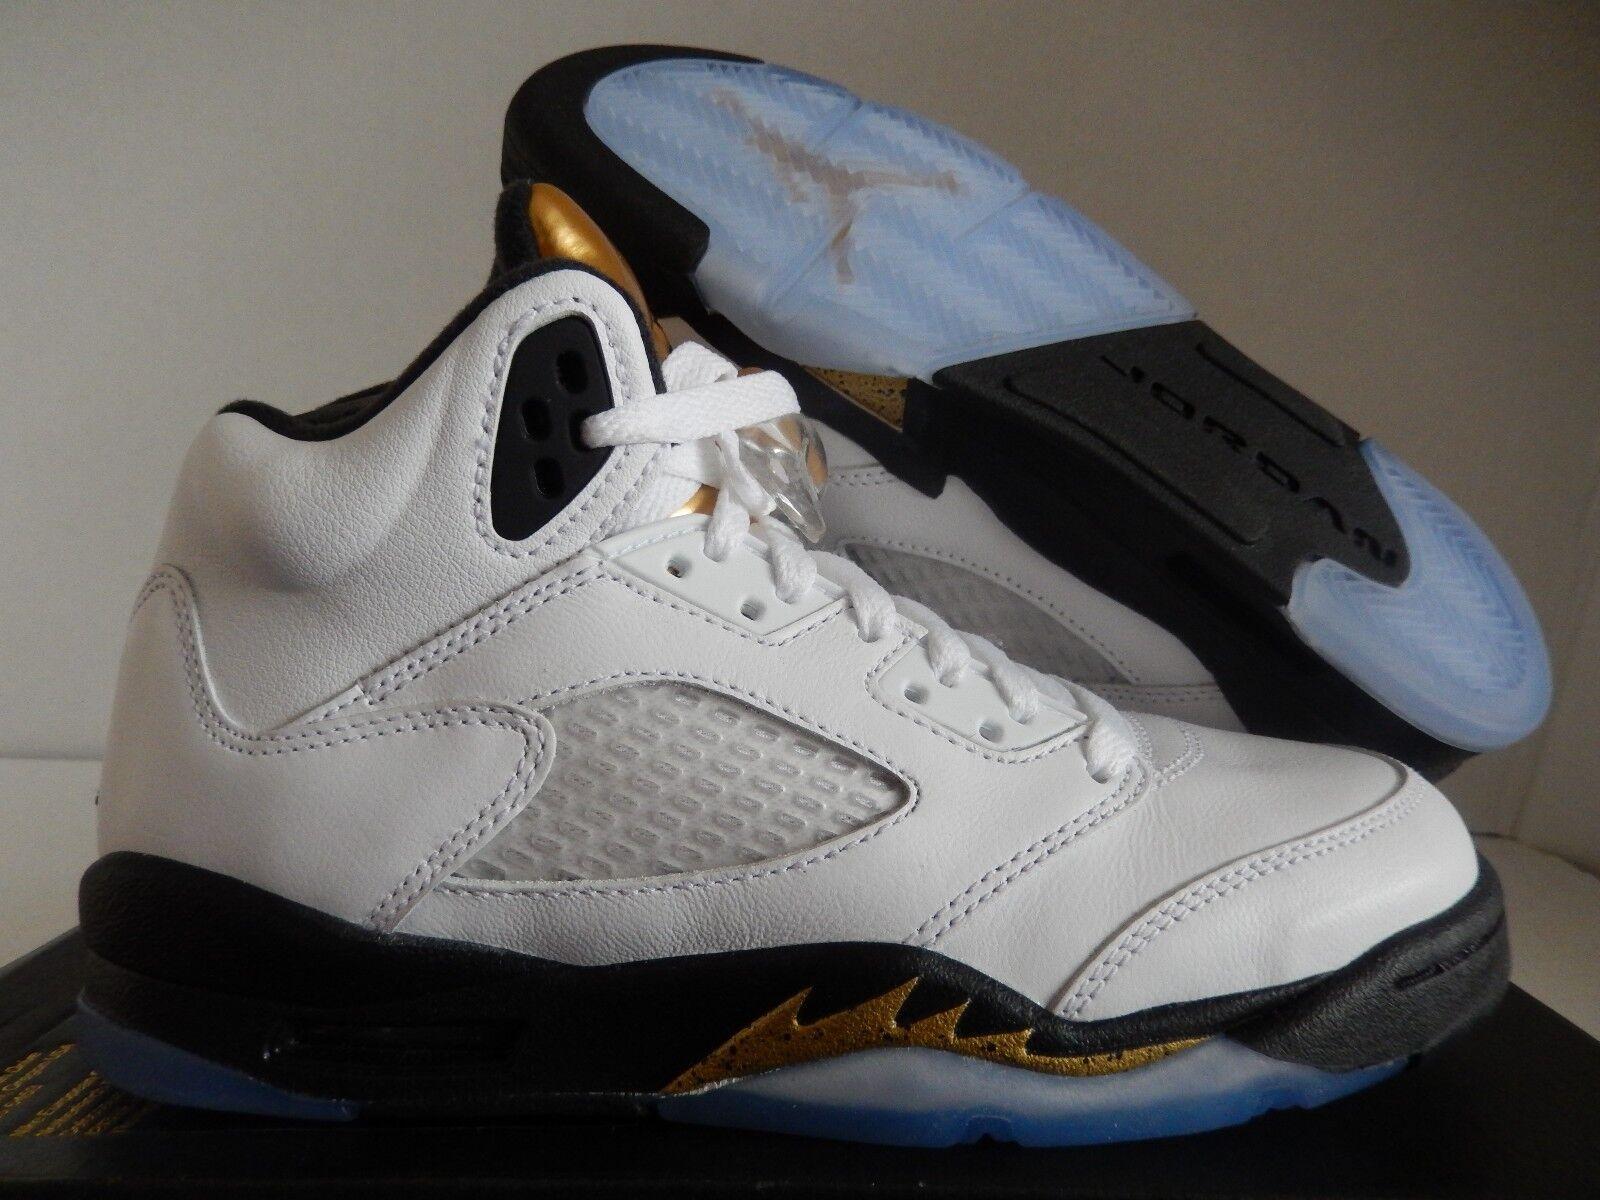 Nike Air Jordan 5 RETRO BG blancoo-moneda blancoo-moneda blancoo-moneda De oro Talla 4.5Y - Para Mujer Talla 6  precio al por mayor